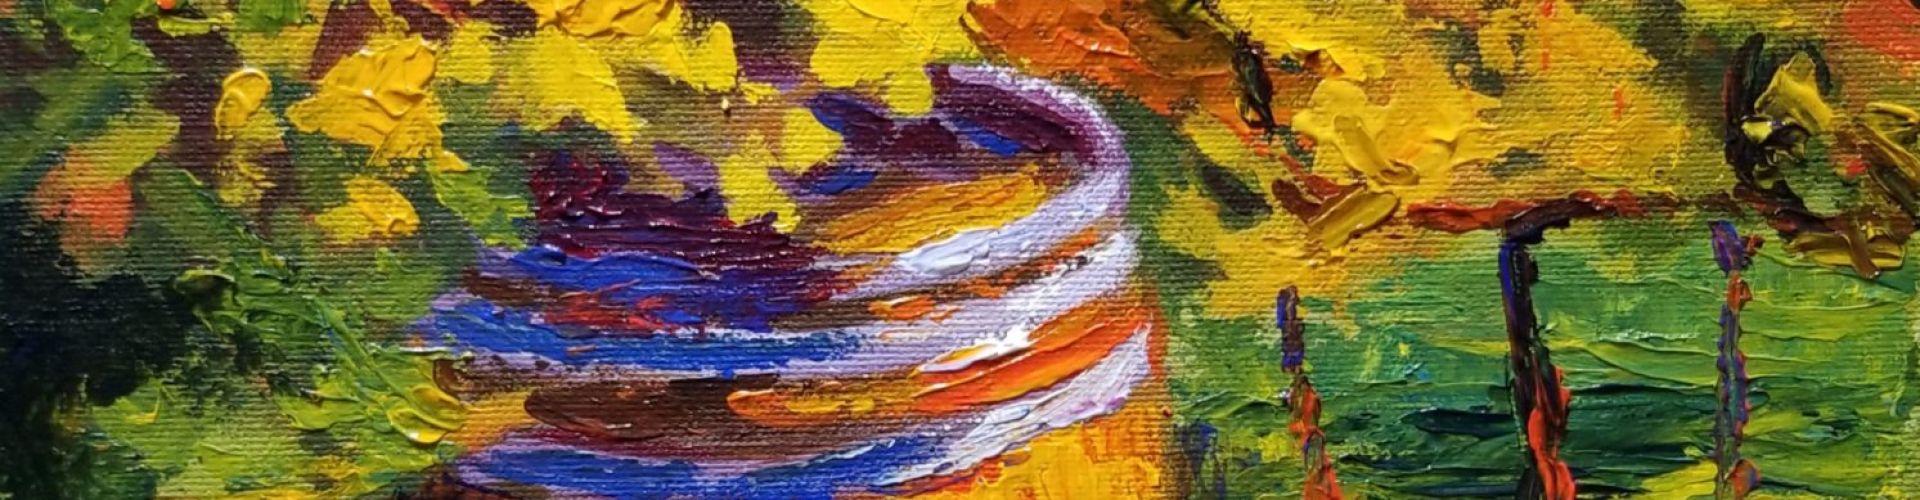 Barrel in the Vines painting by Linda Lovisa